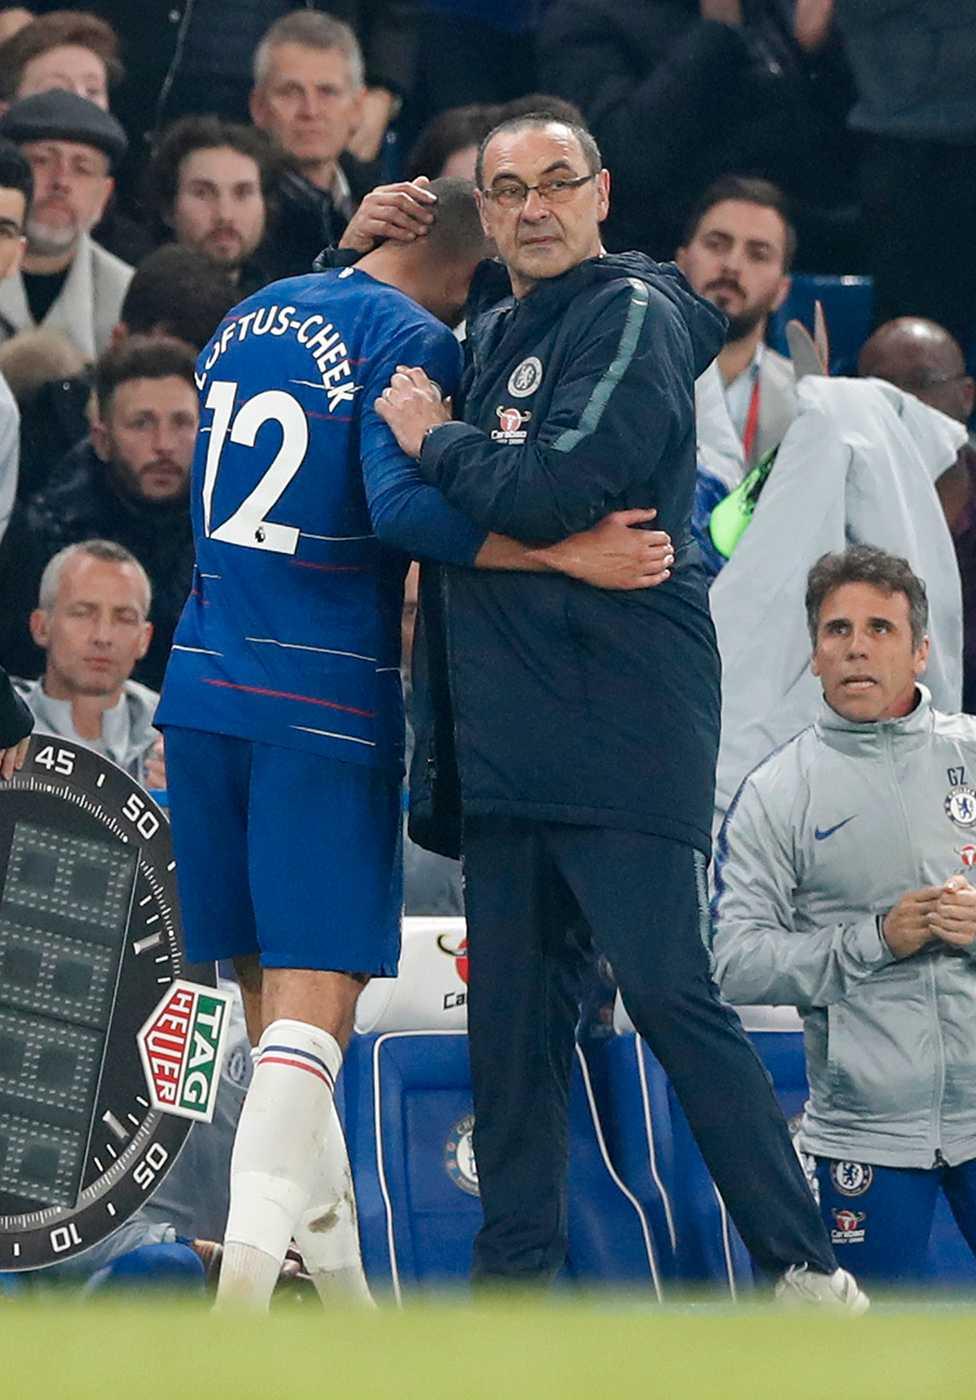 Chelseas manager Maurizio Sarri med Ruben Loftus-Cheek.